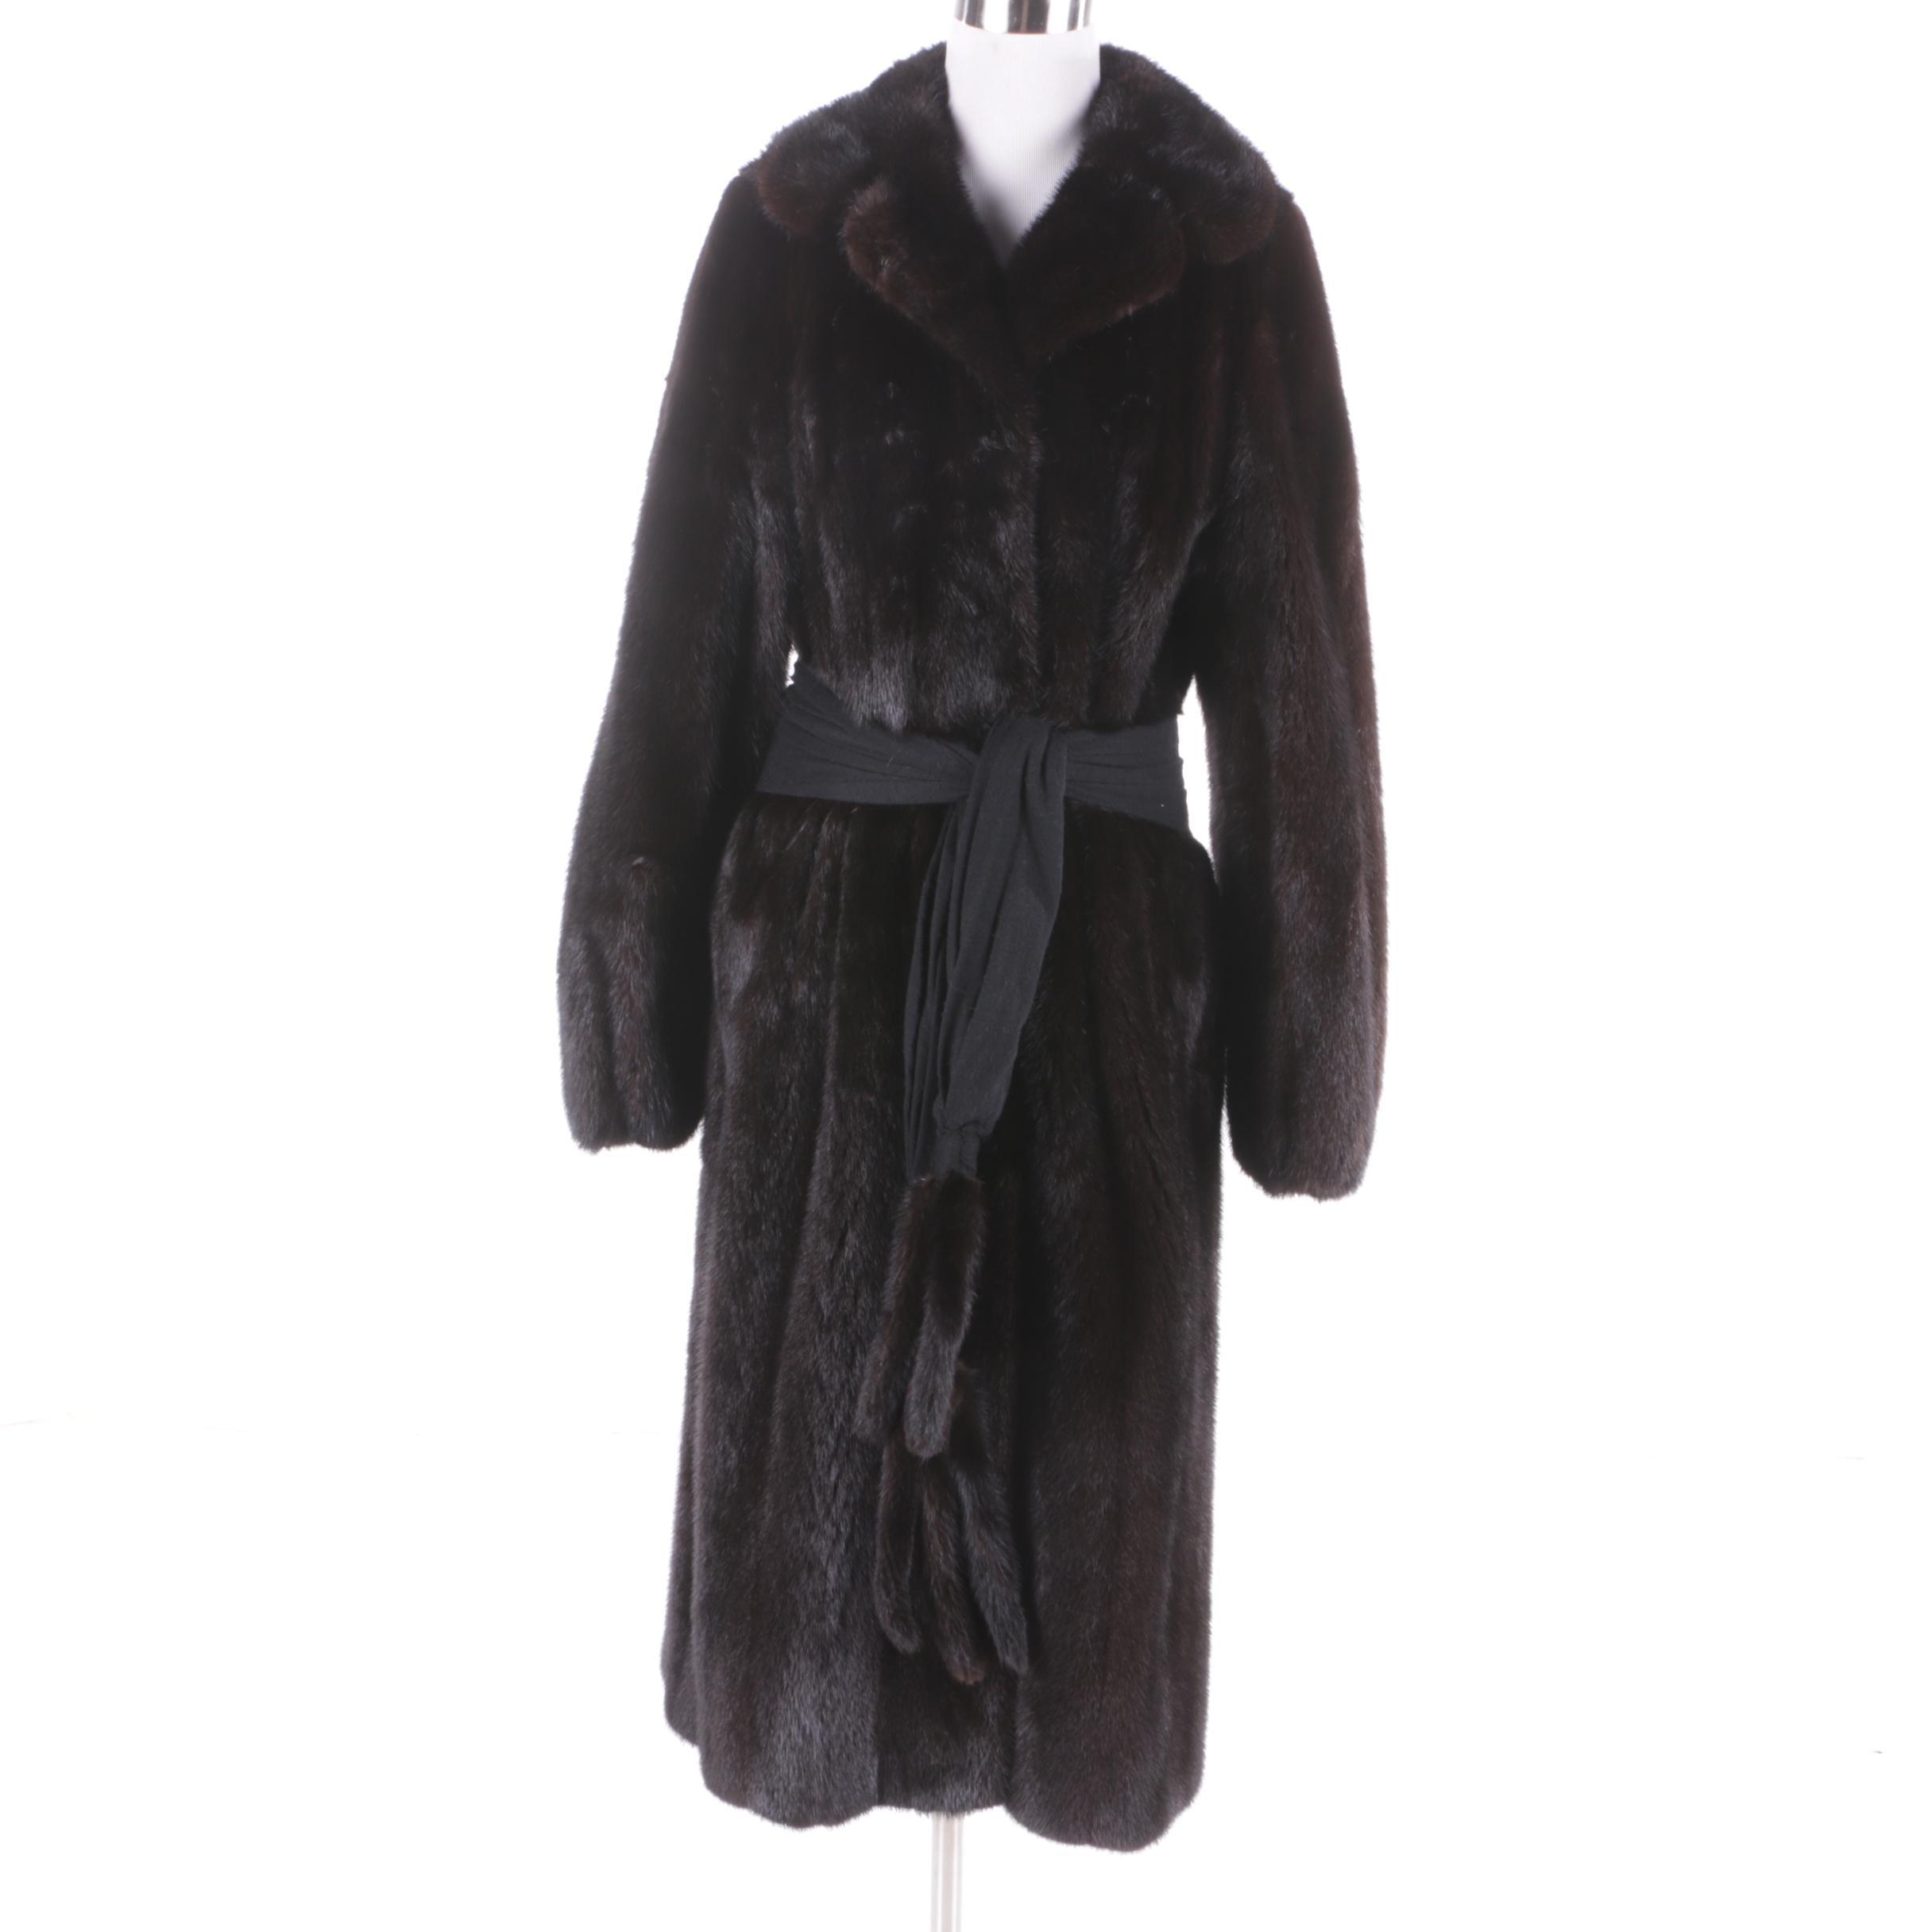 Women's Vintage Barth-Wind Dark Mahogany Mink Fur Coat with Scarf